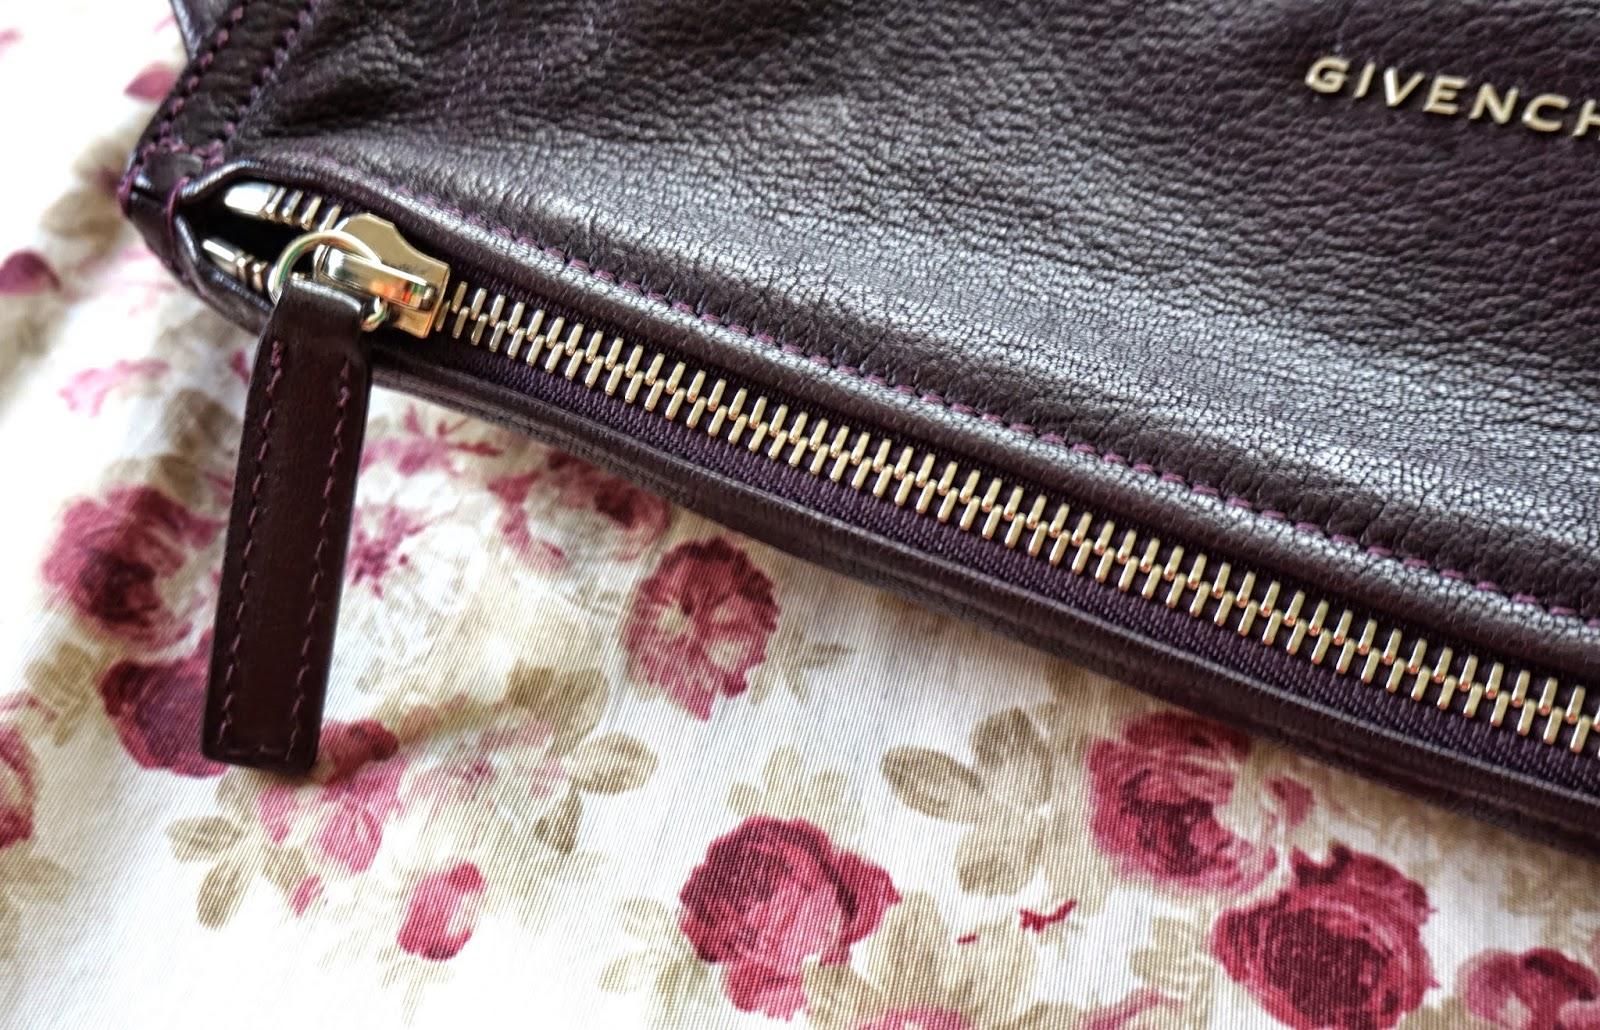 597fc73e01ed Here s a semi-close-up shot of the zipper. The zippers of Pandora 1 feel a  little  stuffed